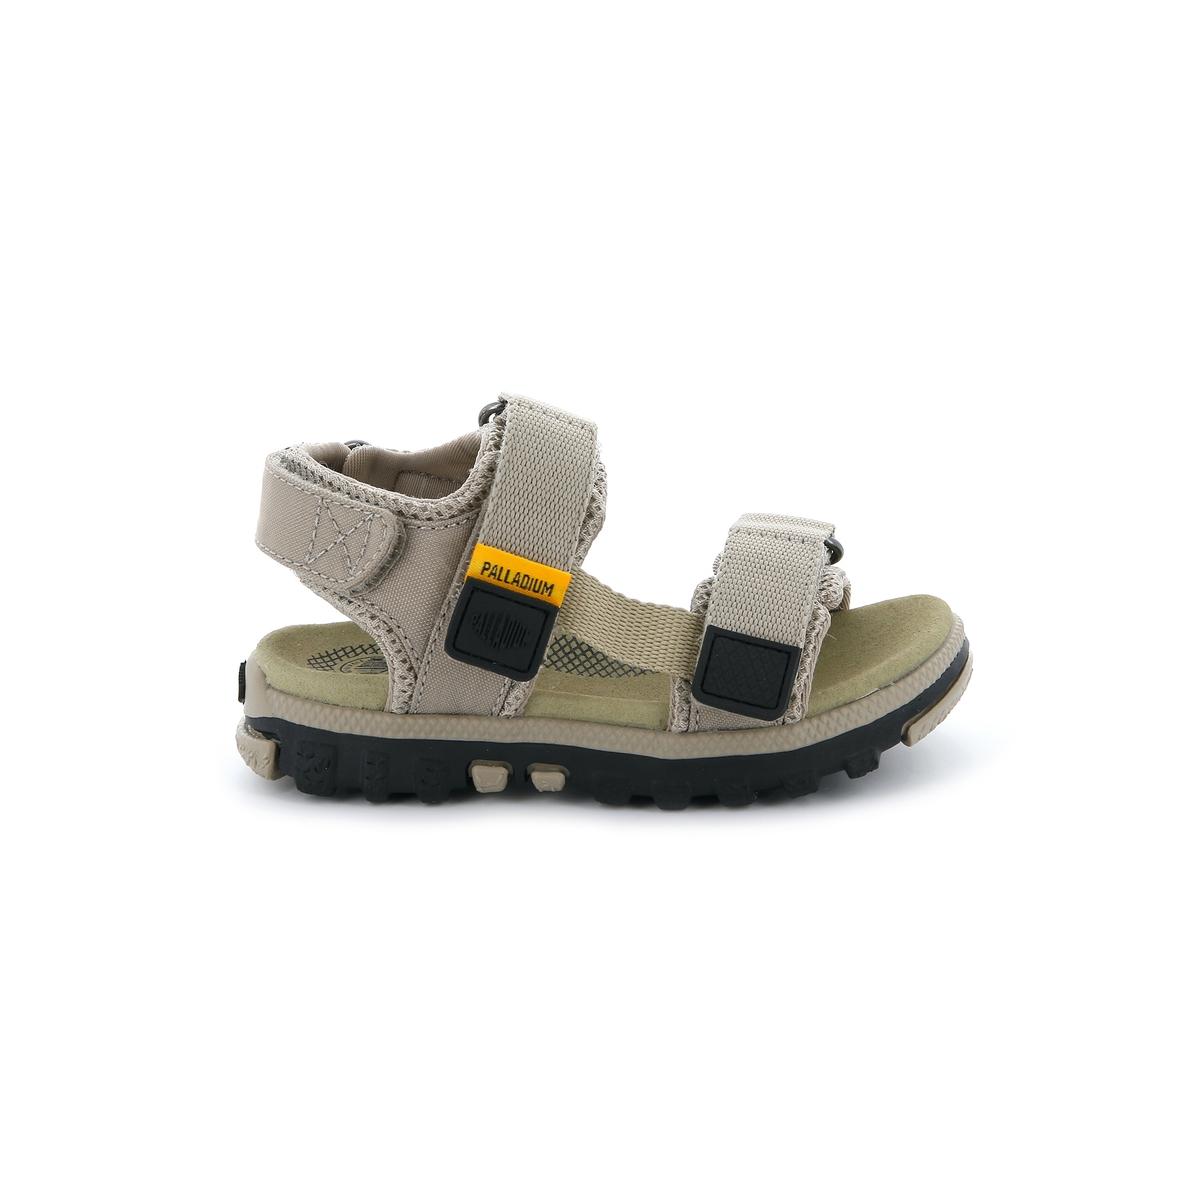 Sandálias com presilha autoaderente, Palla Nikkoo